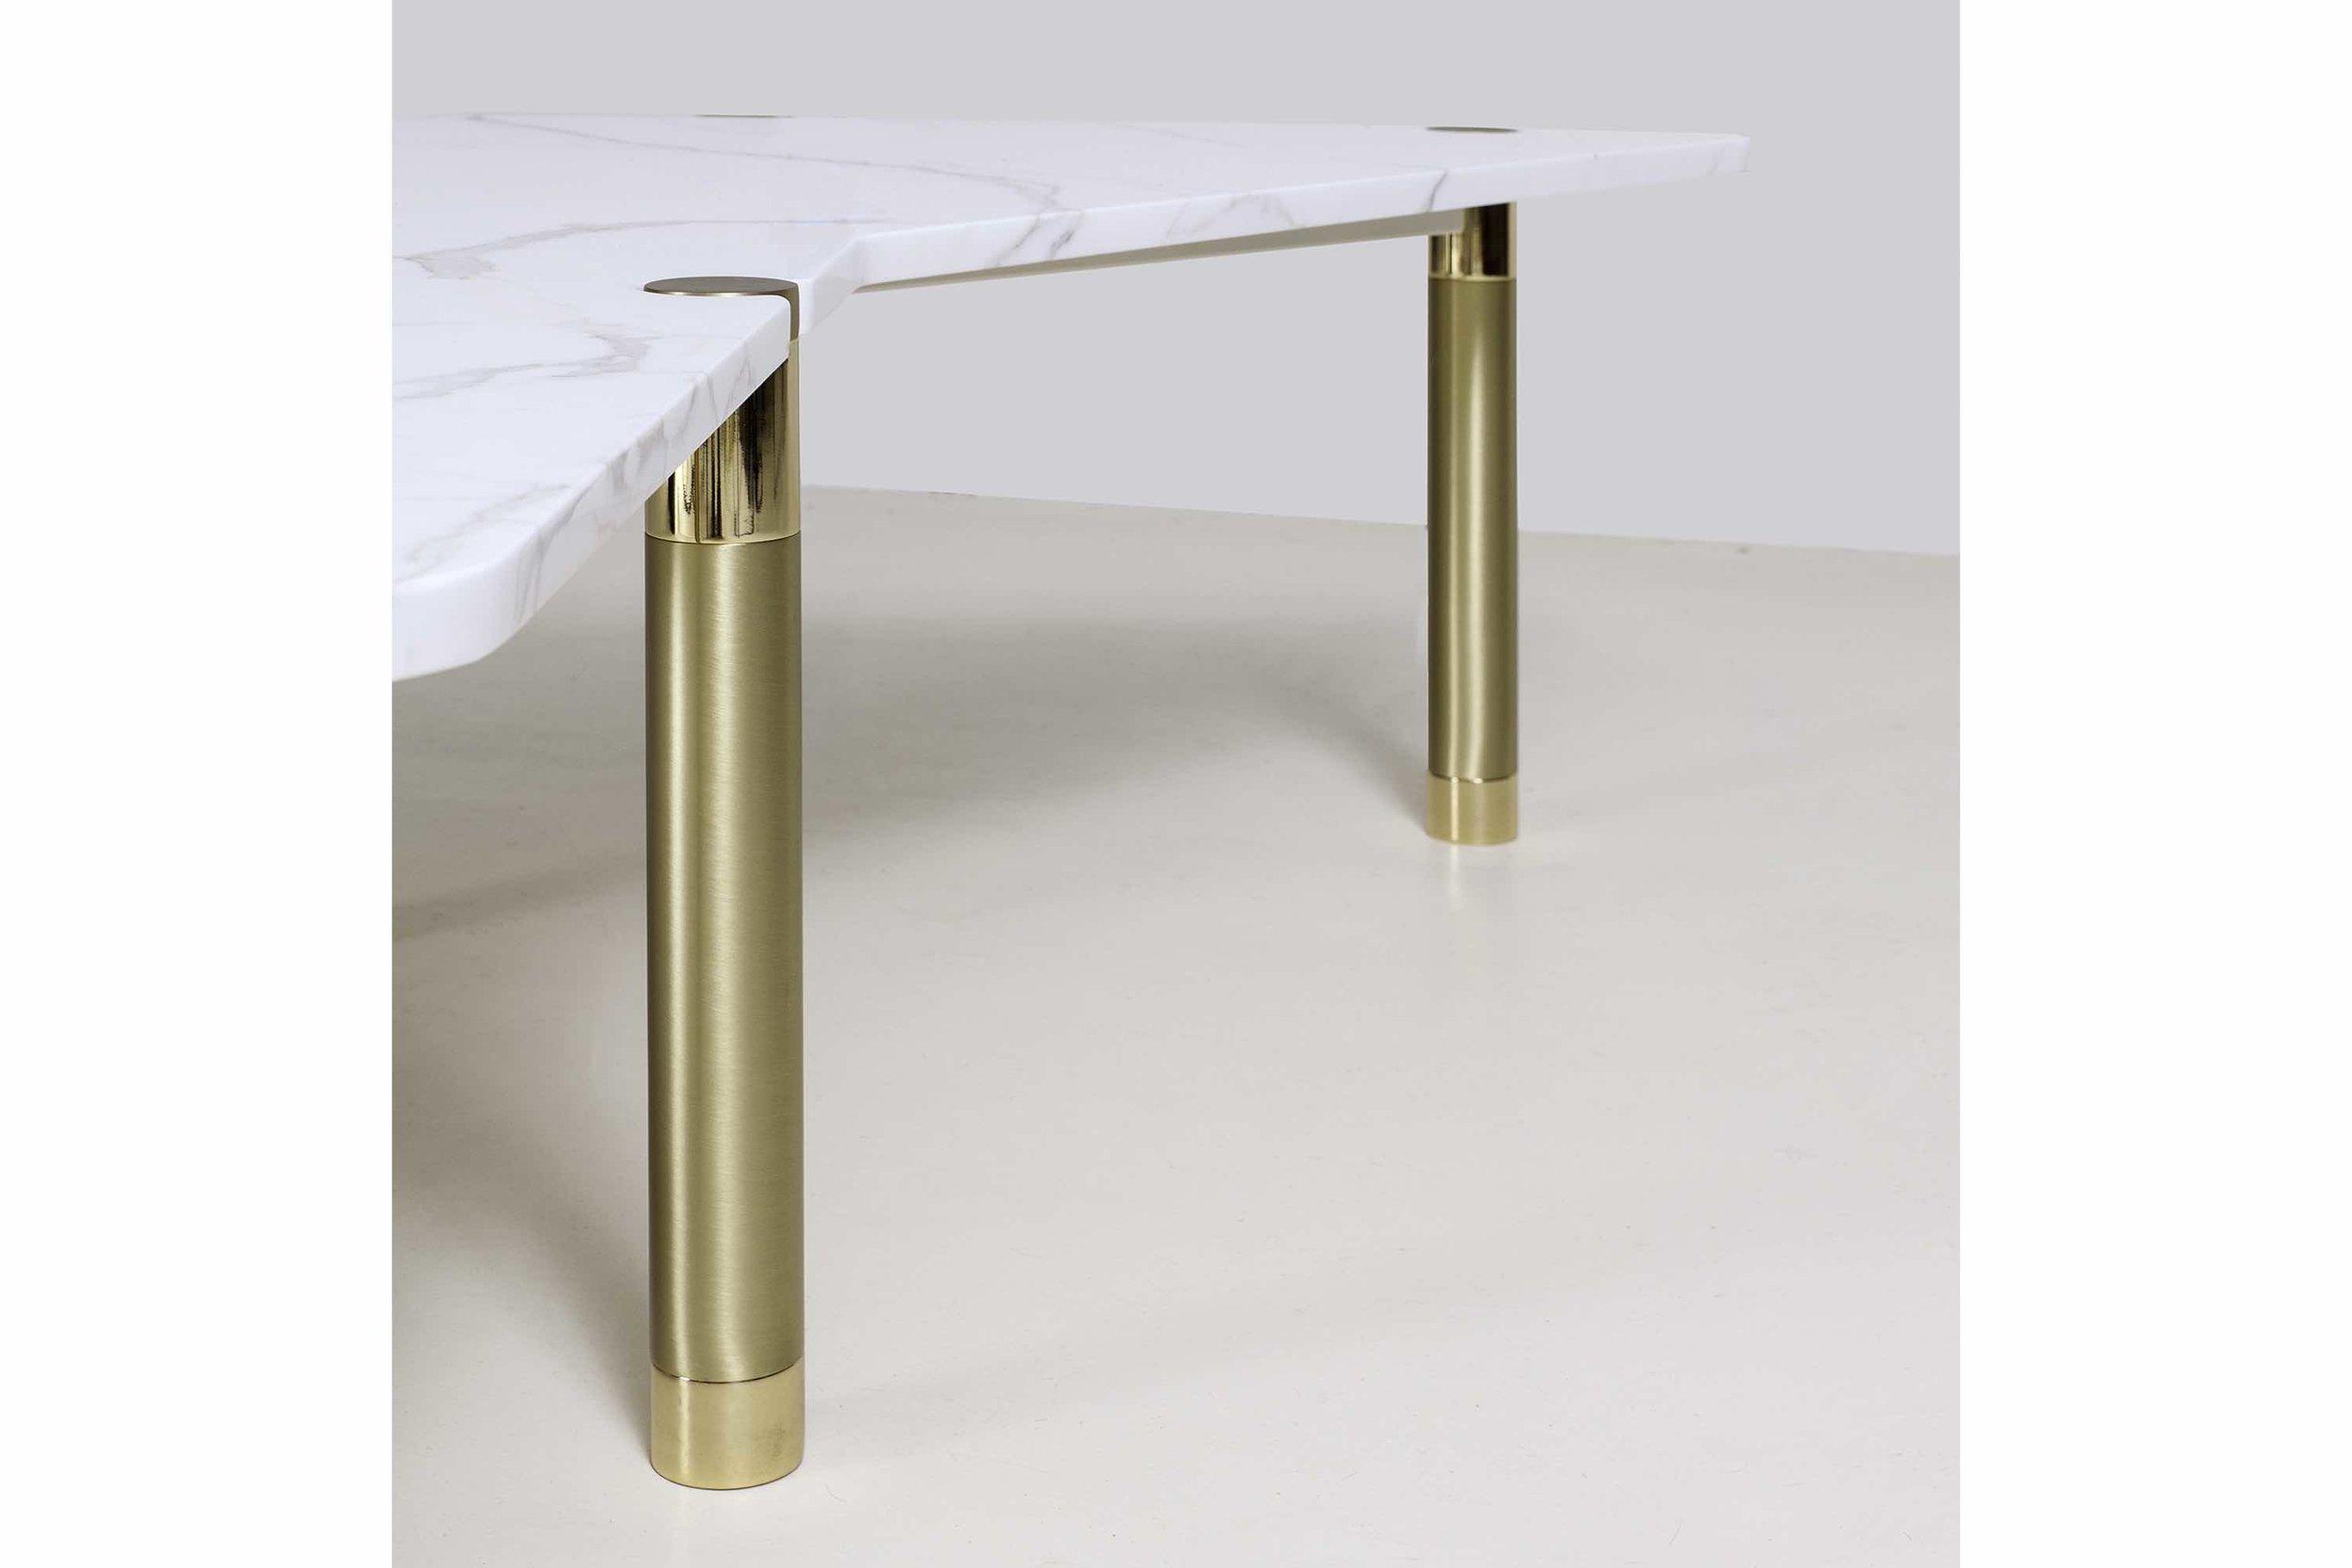 Avram_Rusu_Nova_Boomerang_Coffee_Table_4.jpeg